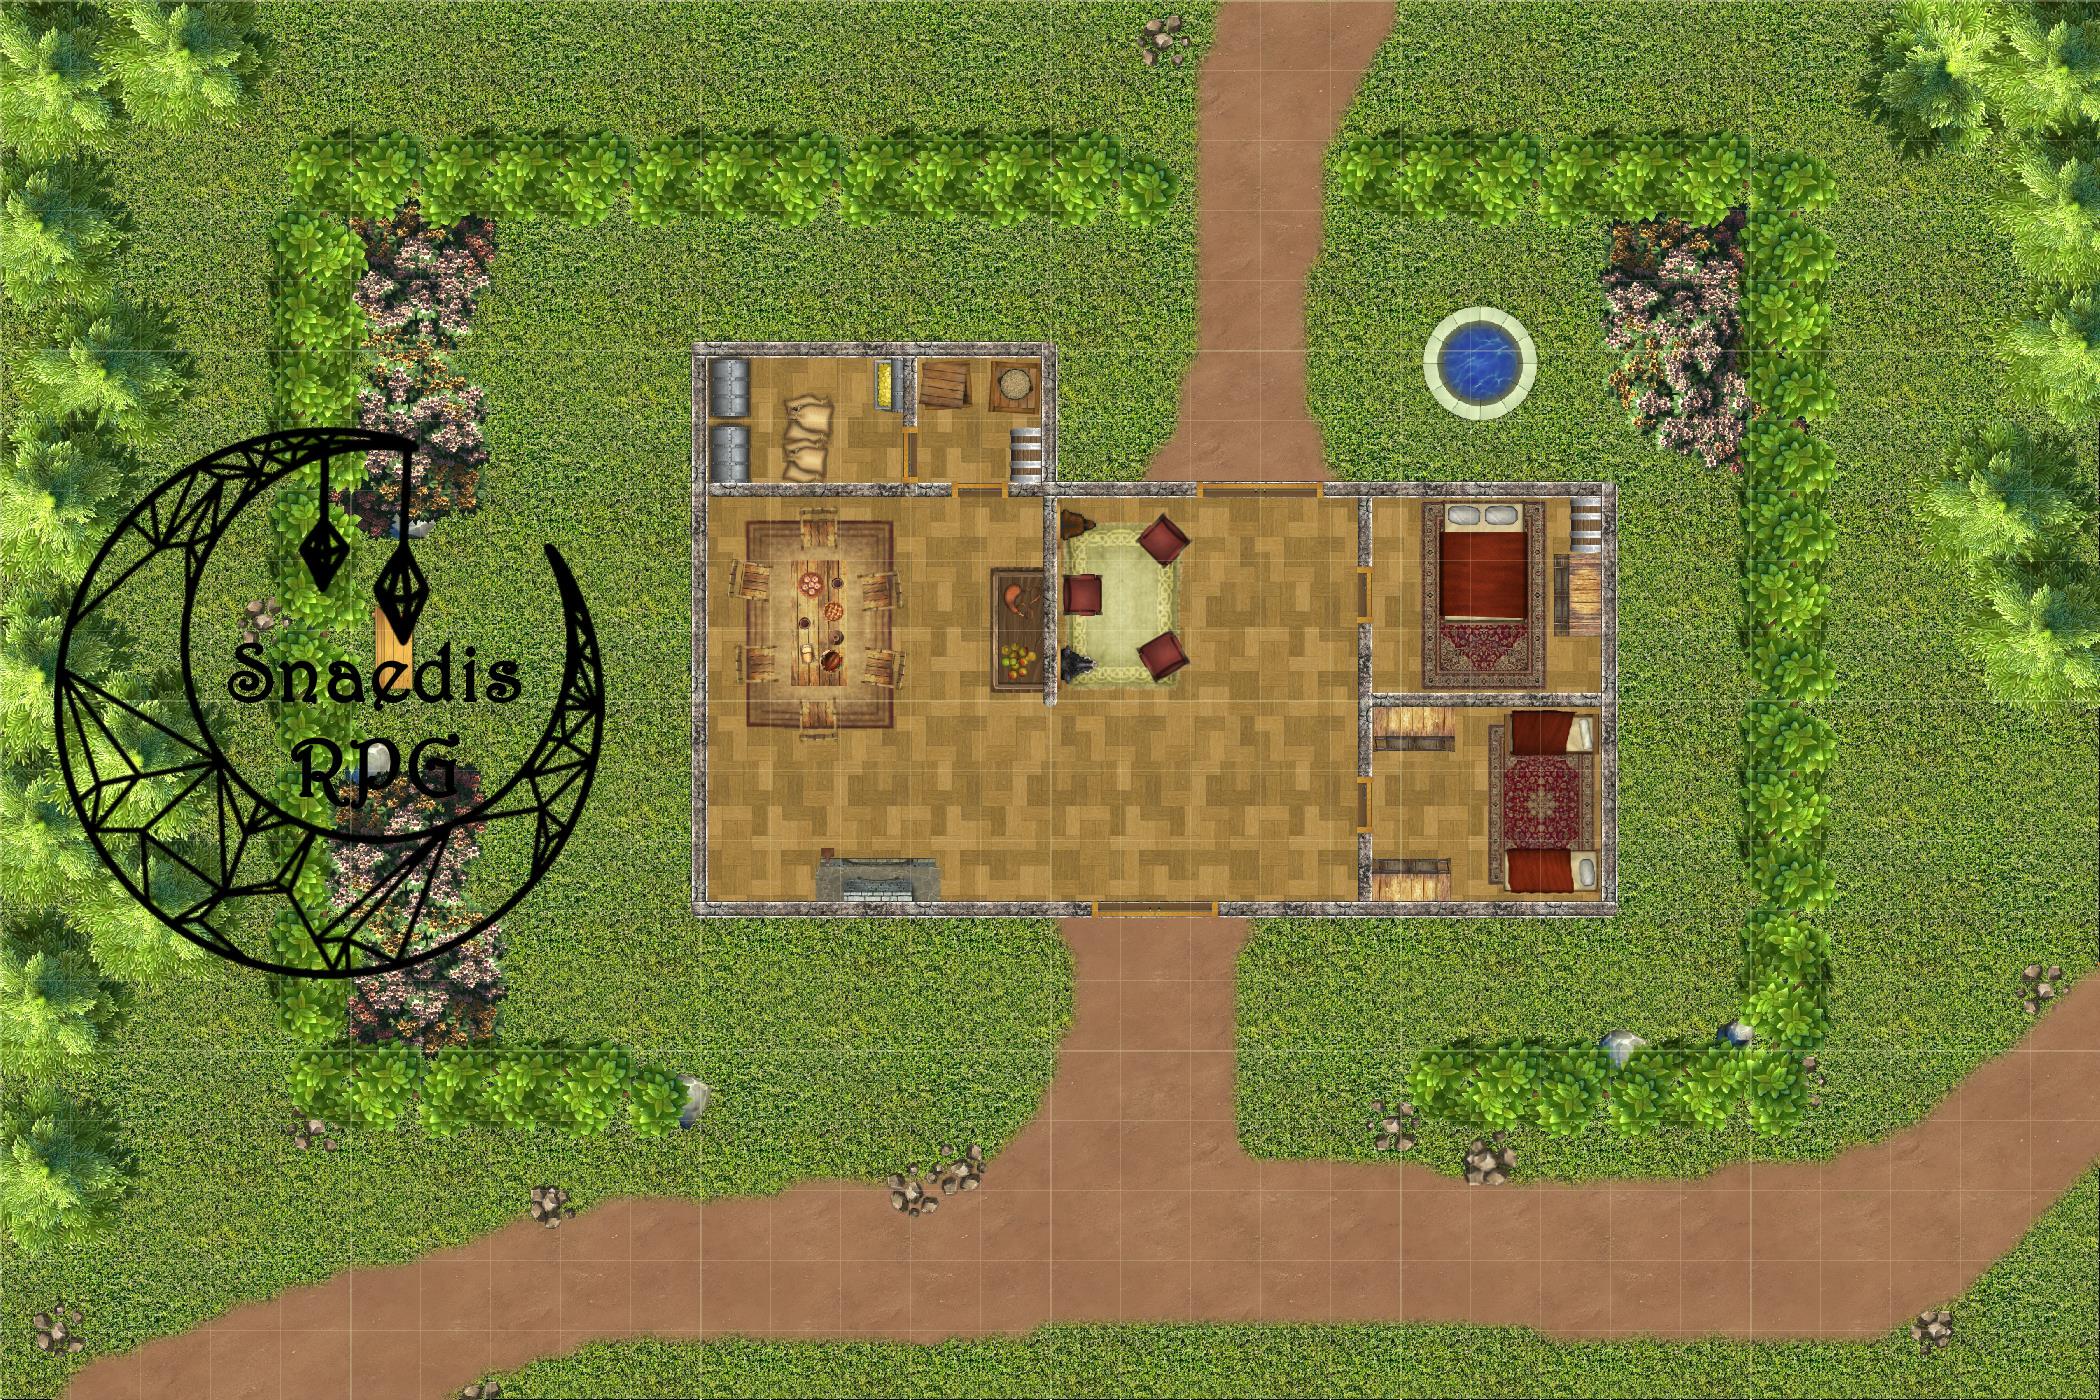 Full map display of House of Ephemei map with Snaedis RPG logo